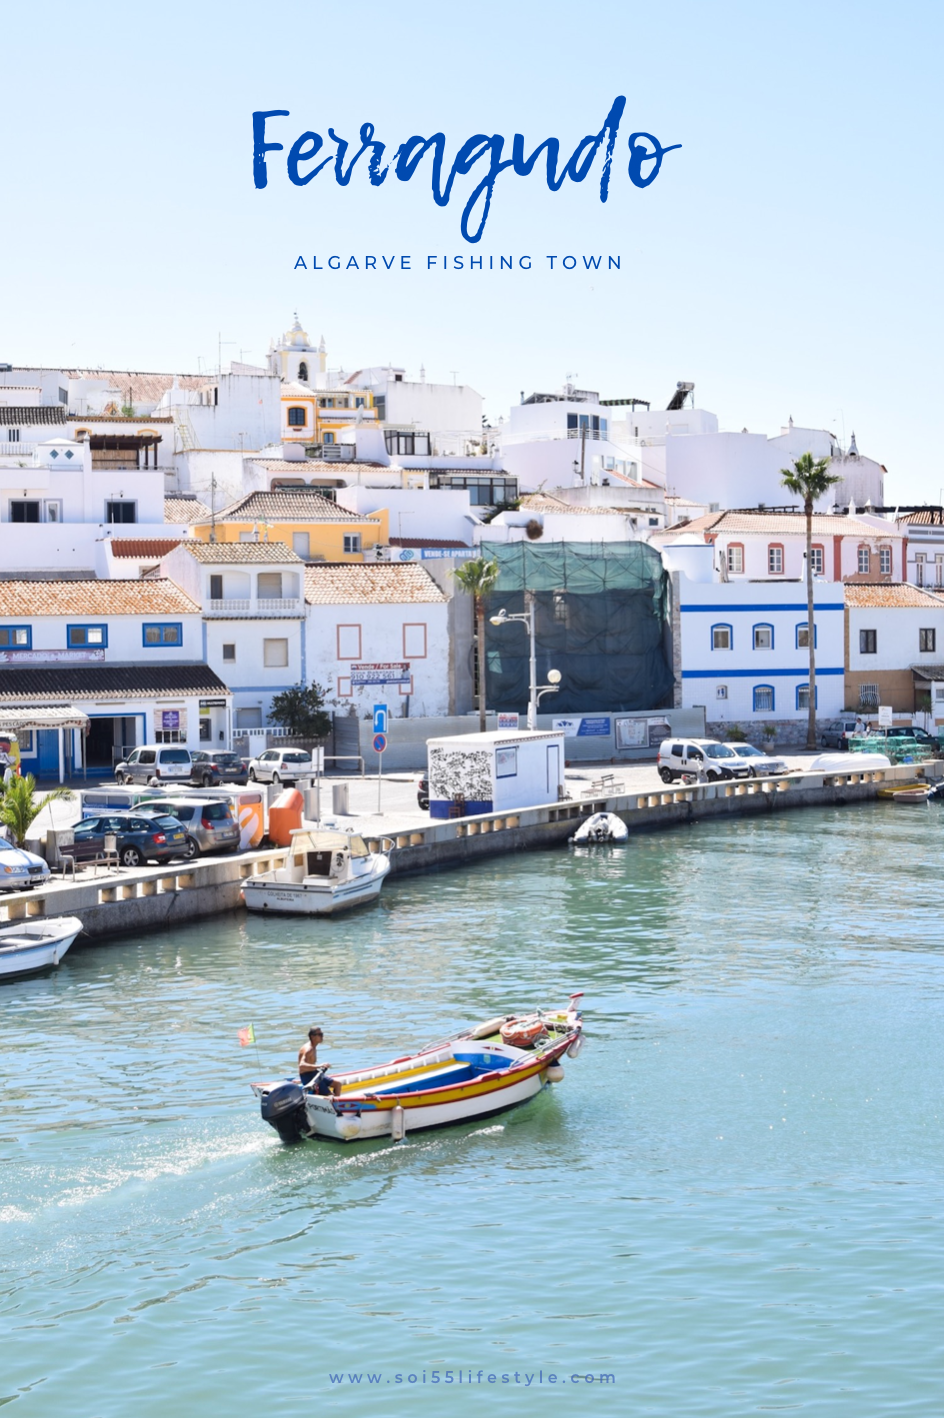 Ferragudo-Algarve-Fishing-Village-pin.JPG